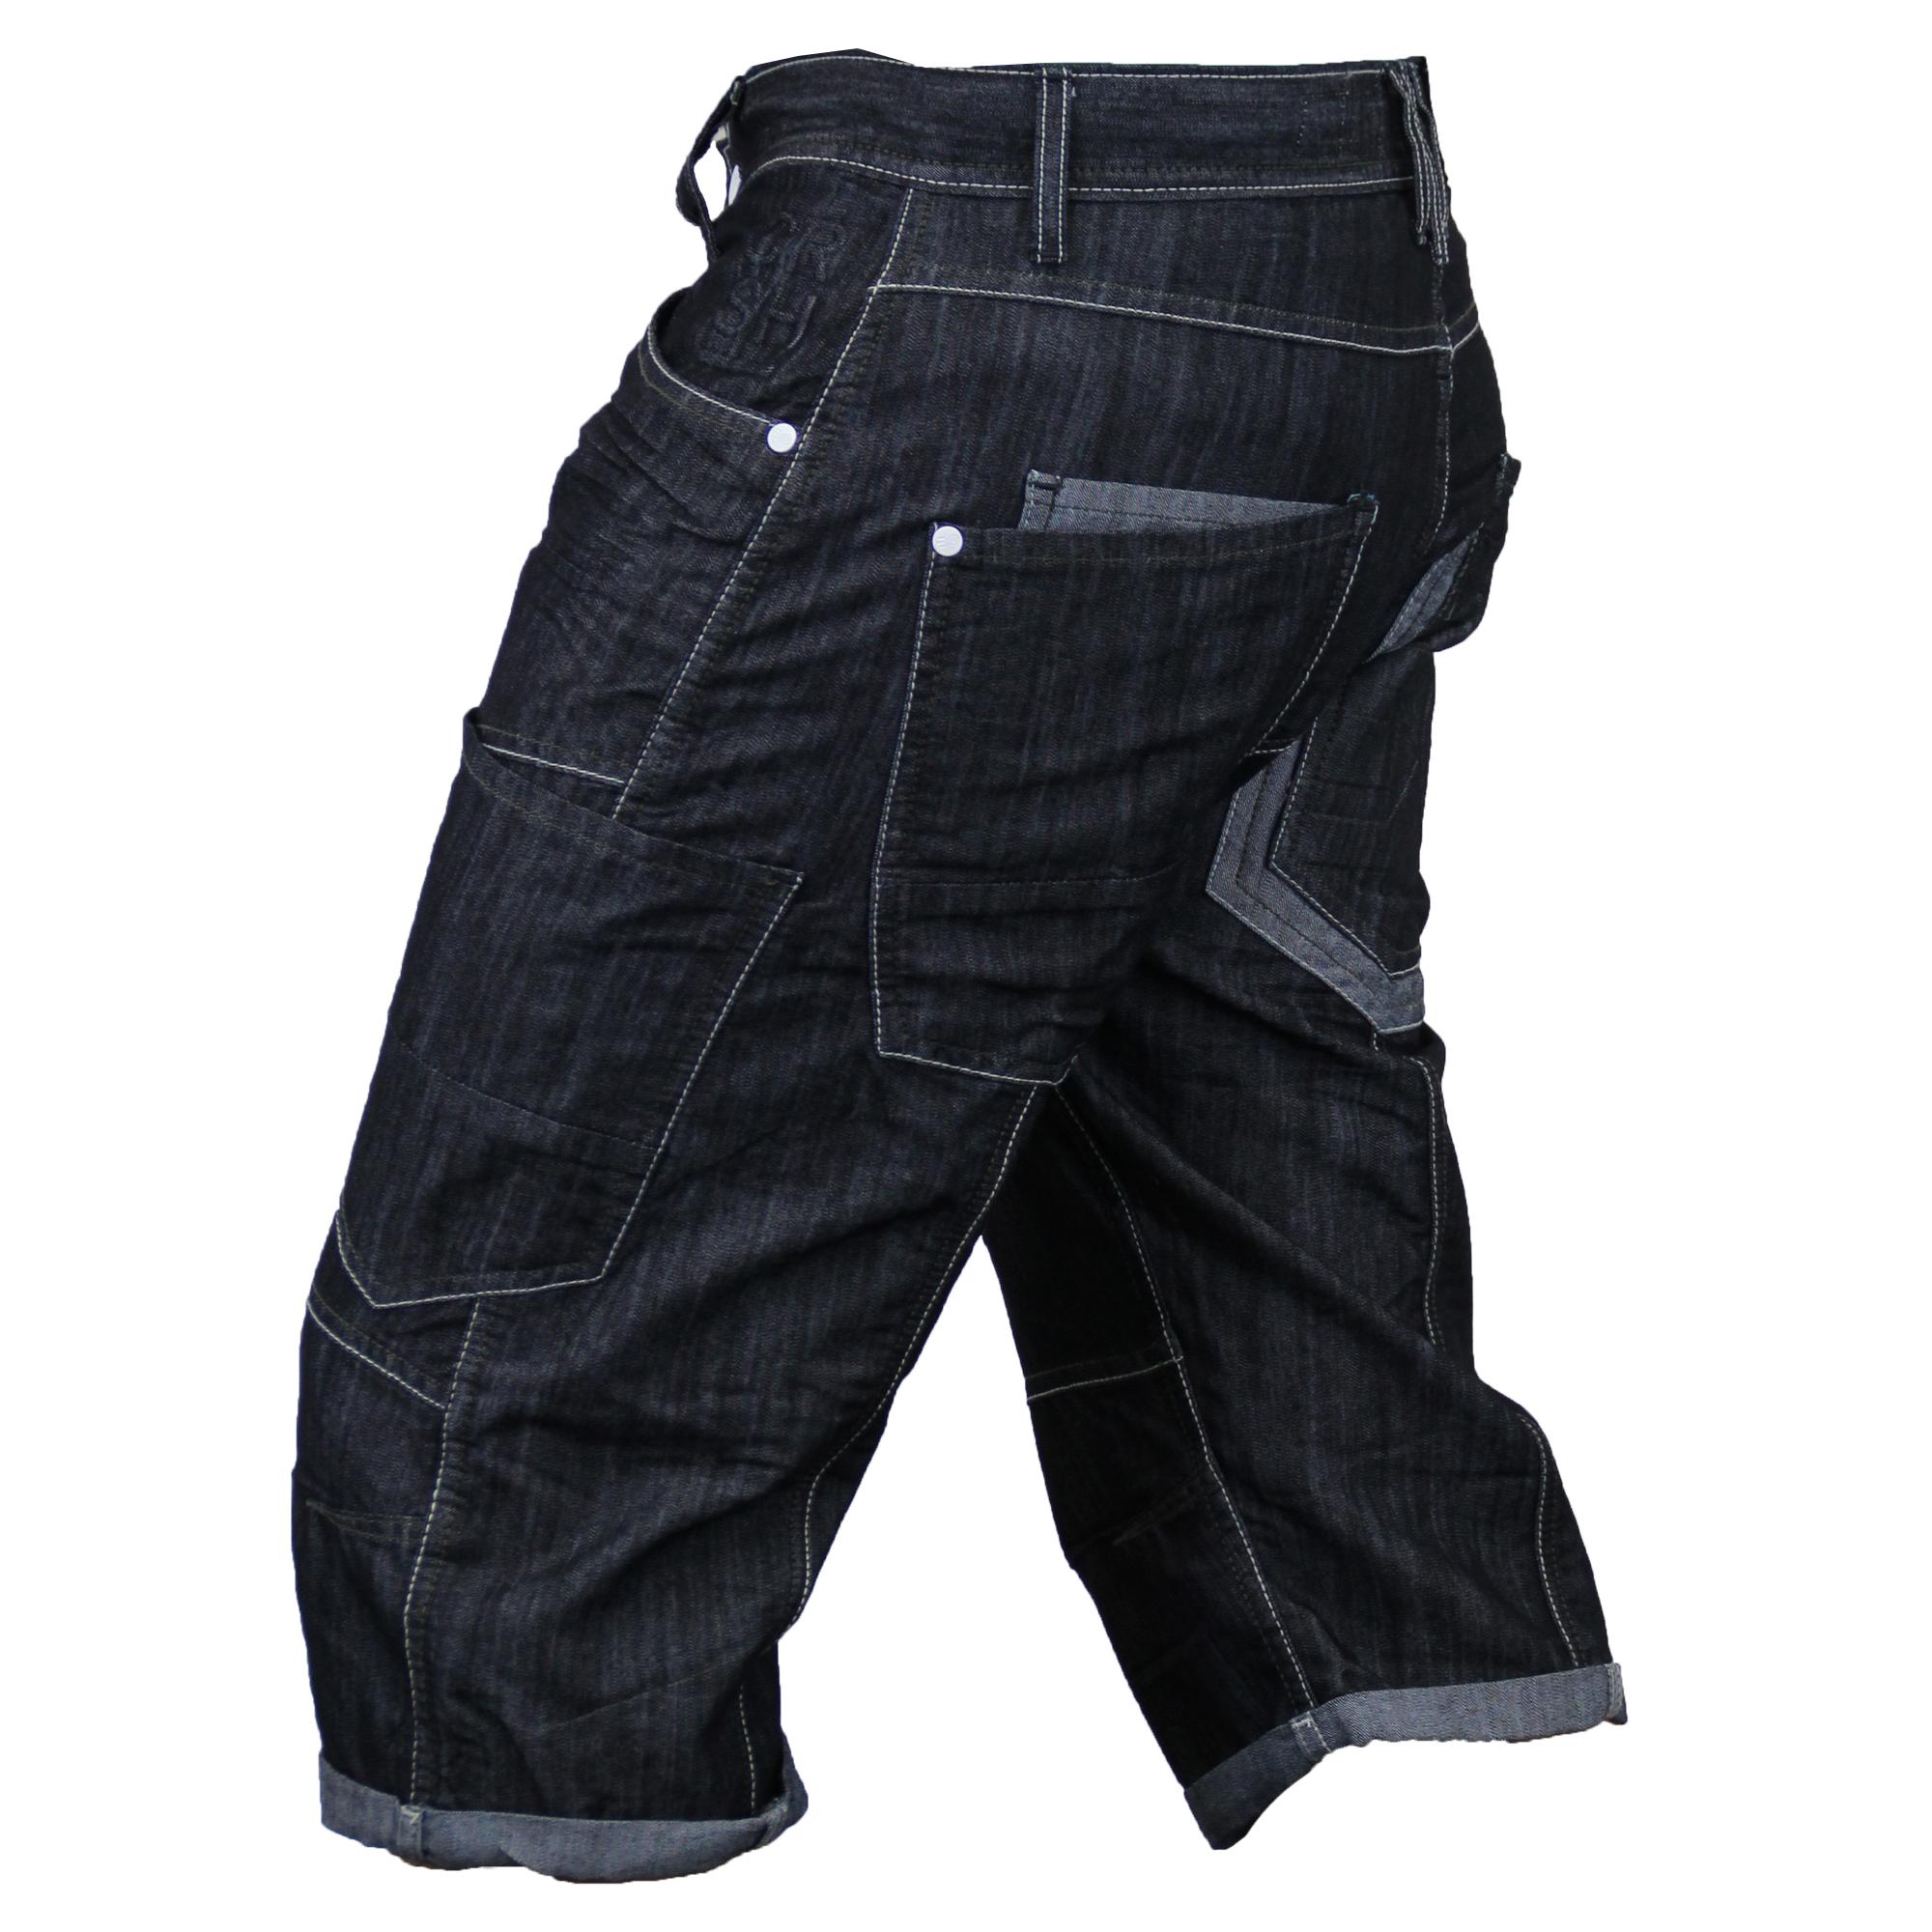 Mens-Crosshatch-Denim-Knee-Length-Combat-Shorts-Cargo-Casual-Fashion-Summer-New 縮圖 25